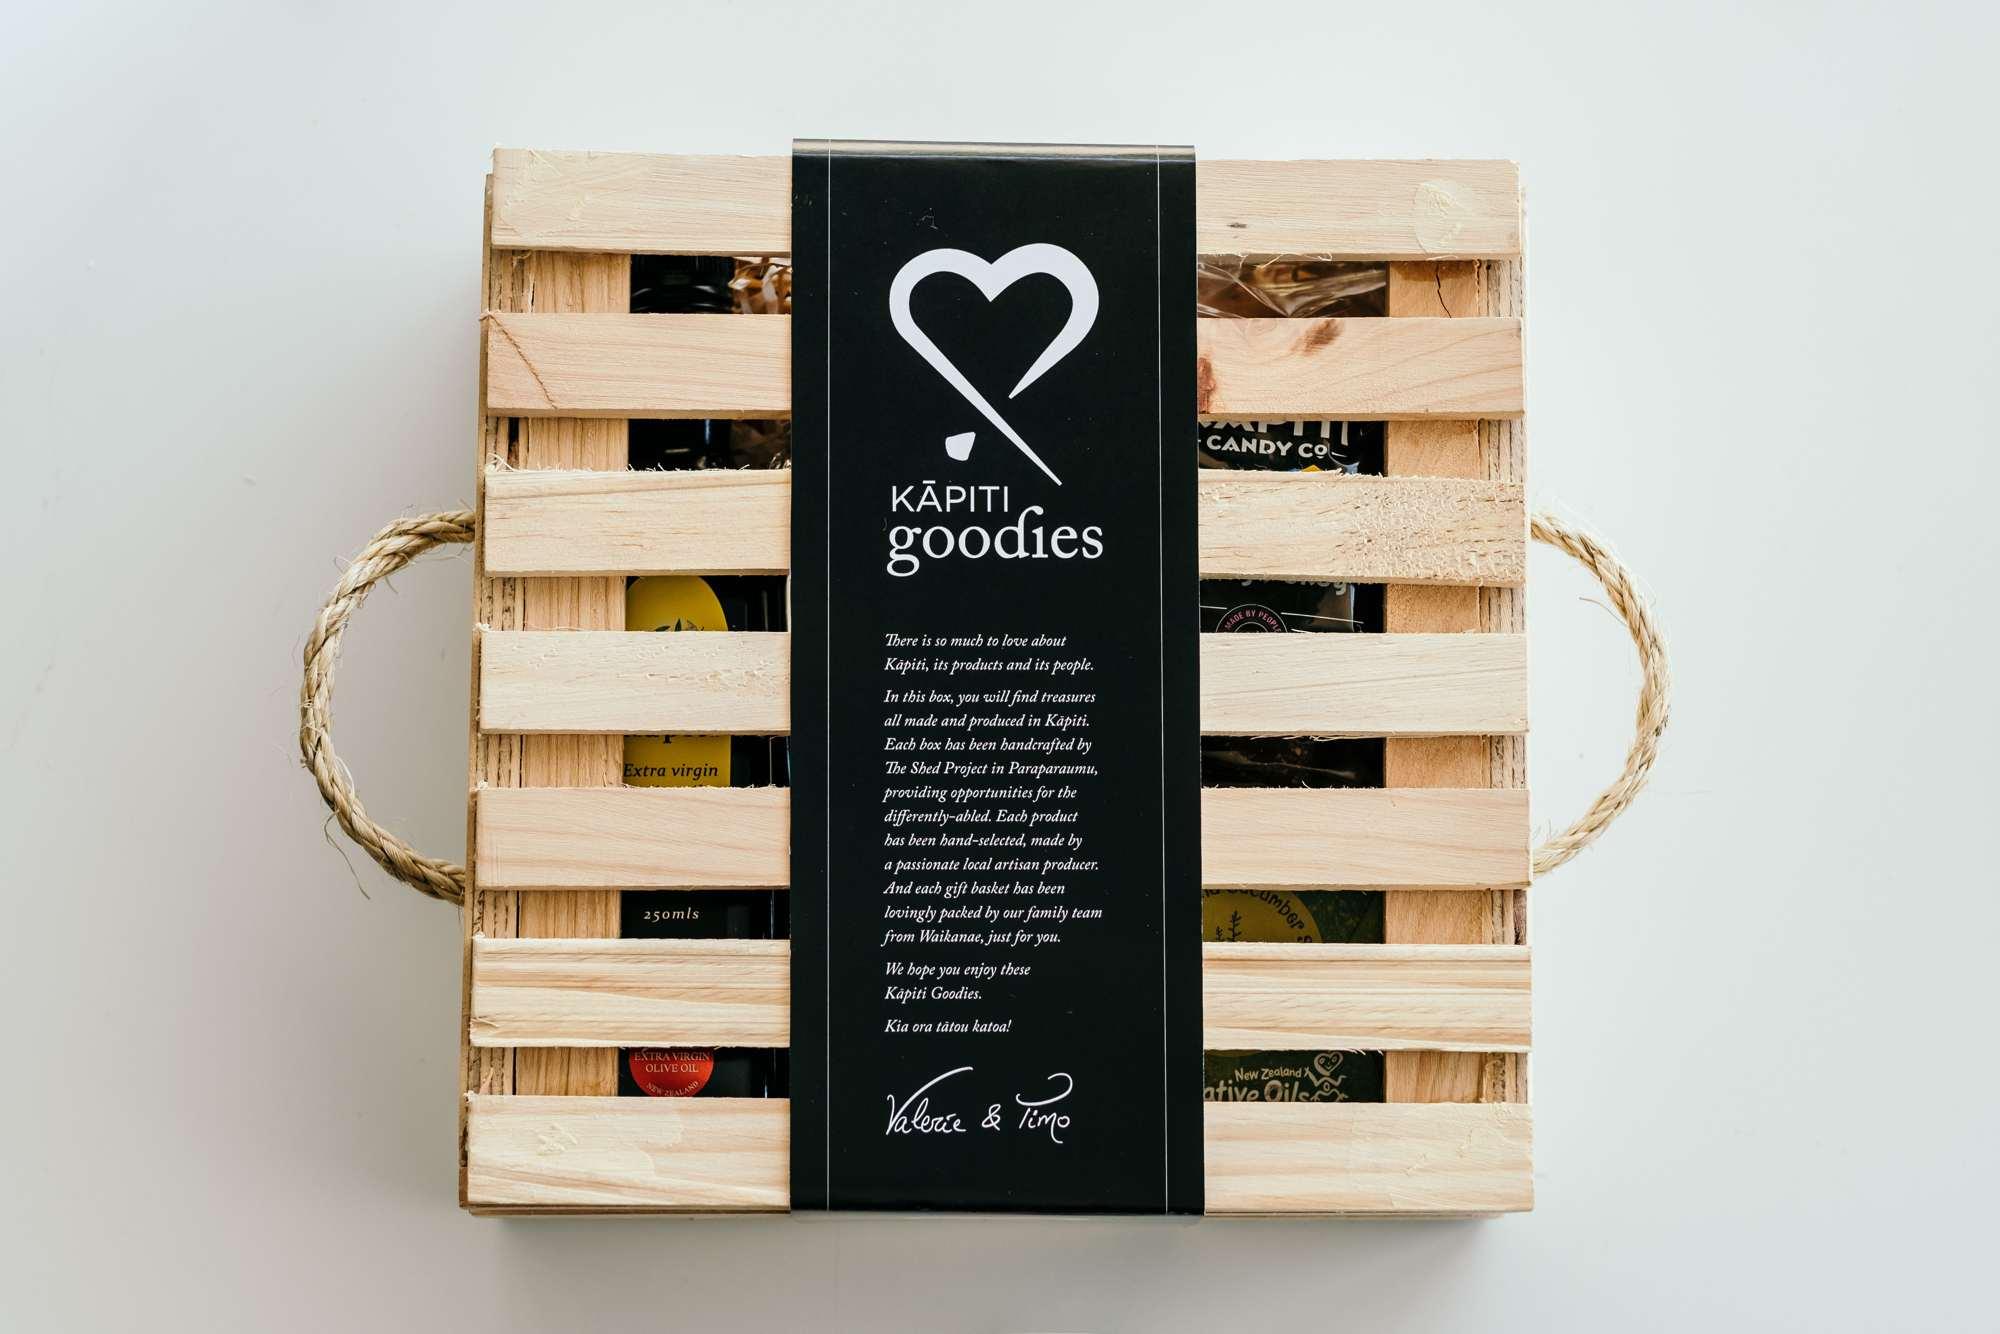 Kapiti Goodies Gift Box Top